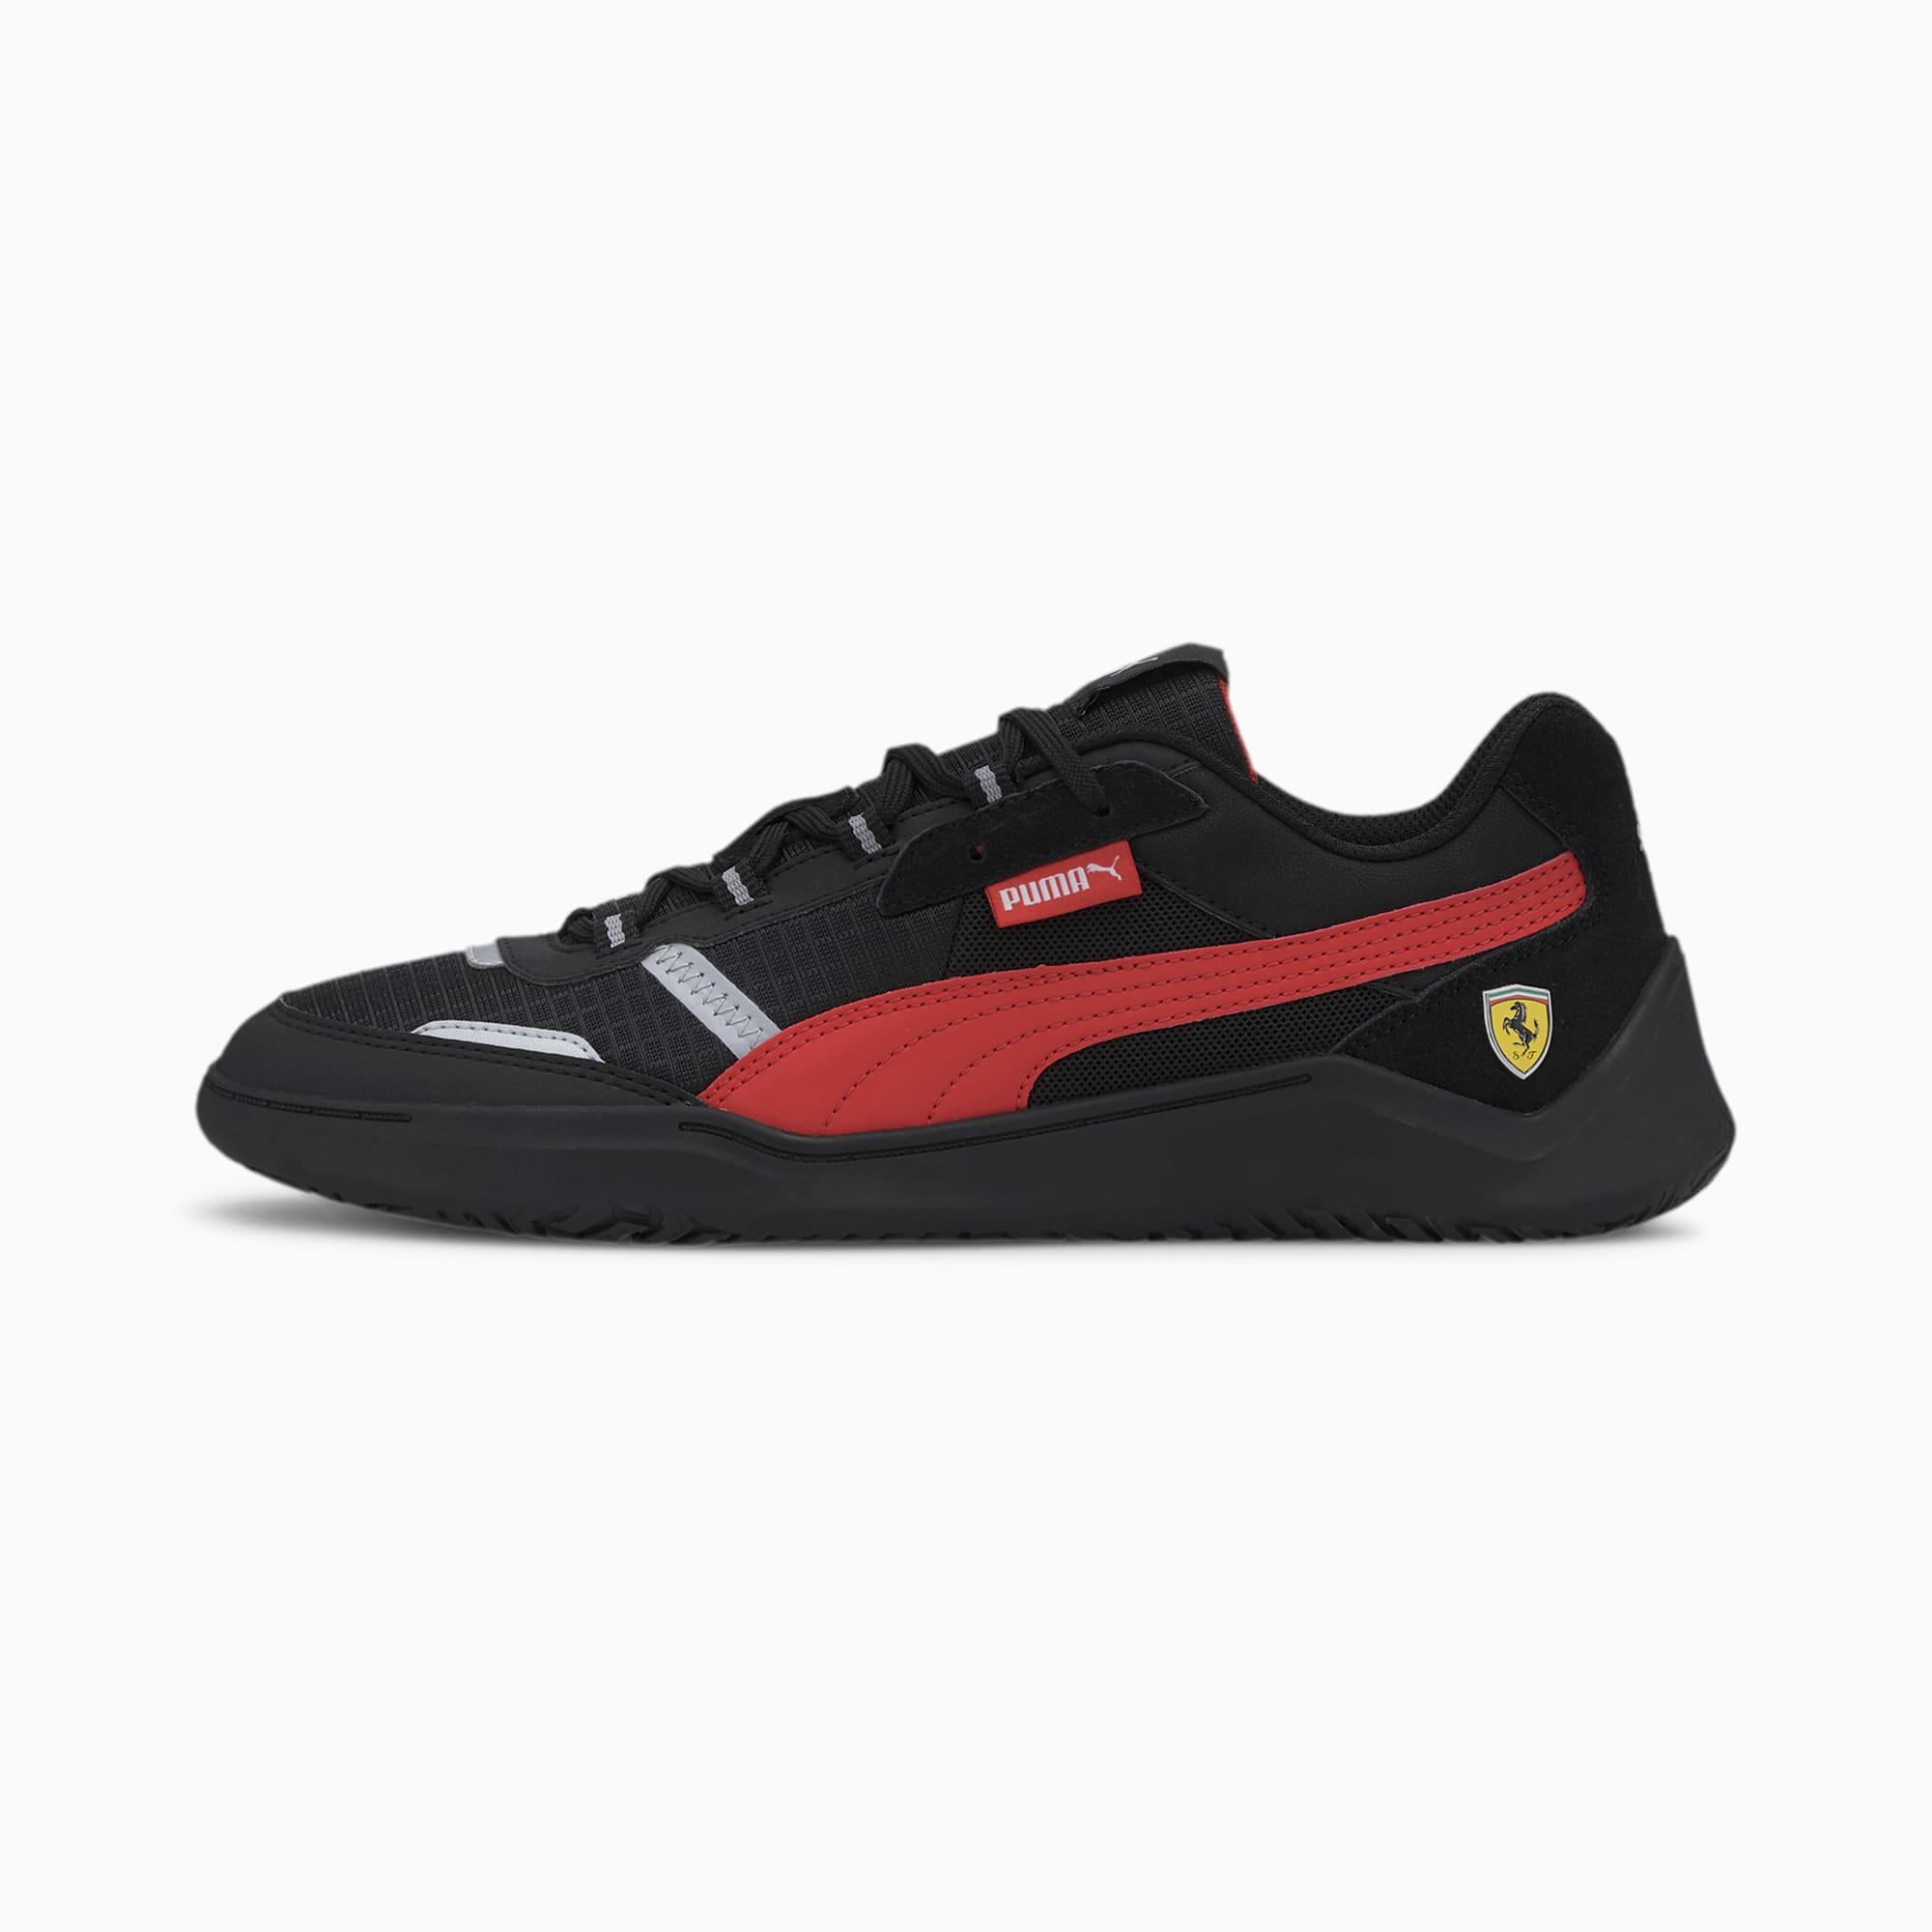 Scuderia Ferrari Race DC Future Men's Motorsport Shoes